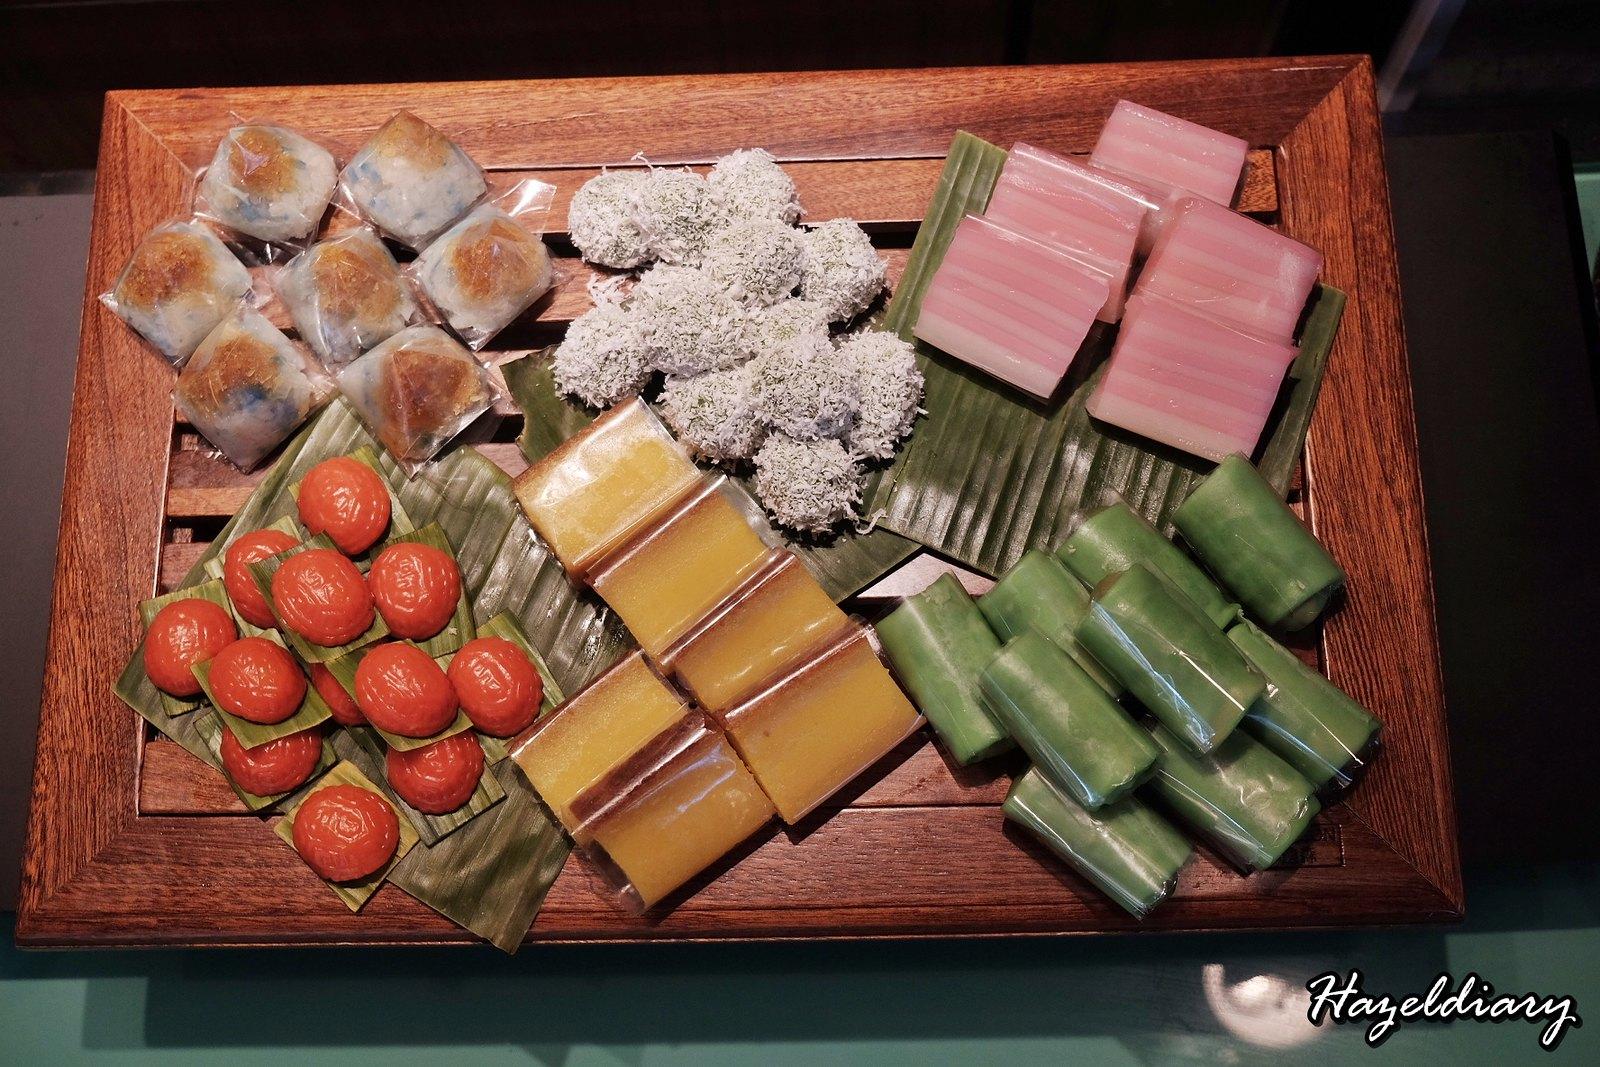 Rasa Sayang Buffet-Mecure Bugis-Traditional Kuehs